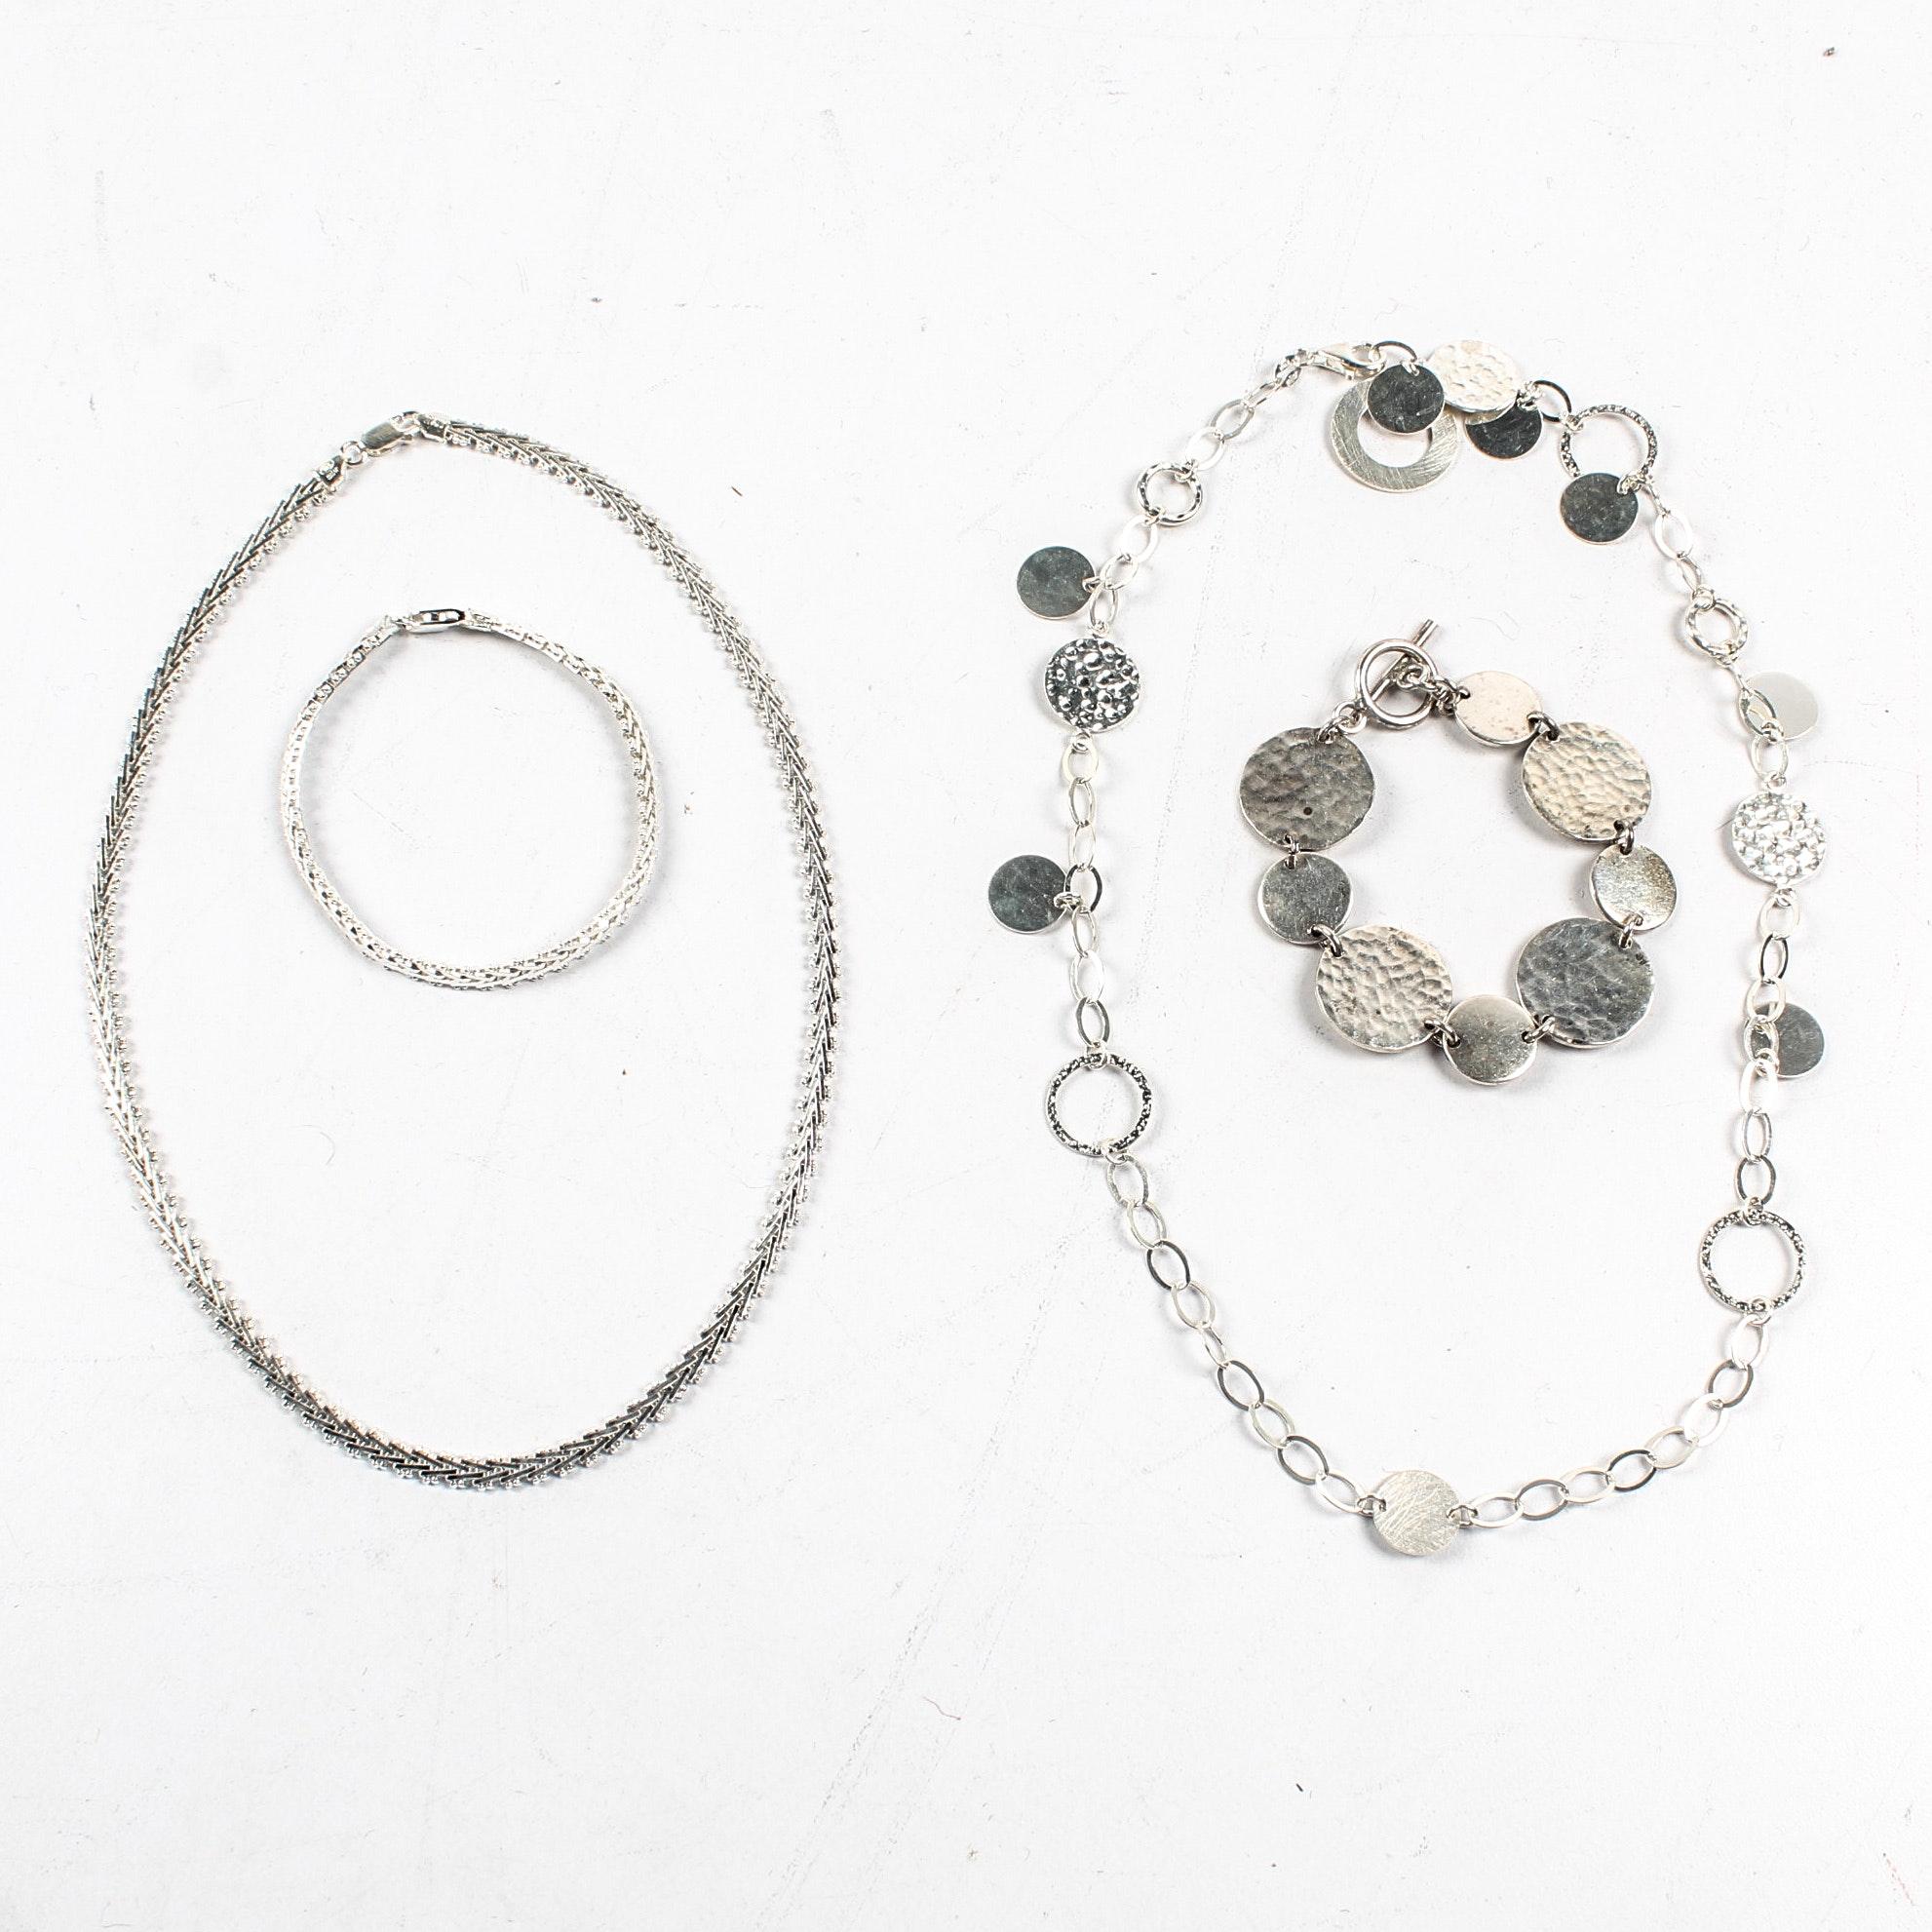 Sterling Silver Coordinating Necklace and Bracelet Sets